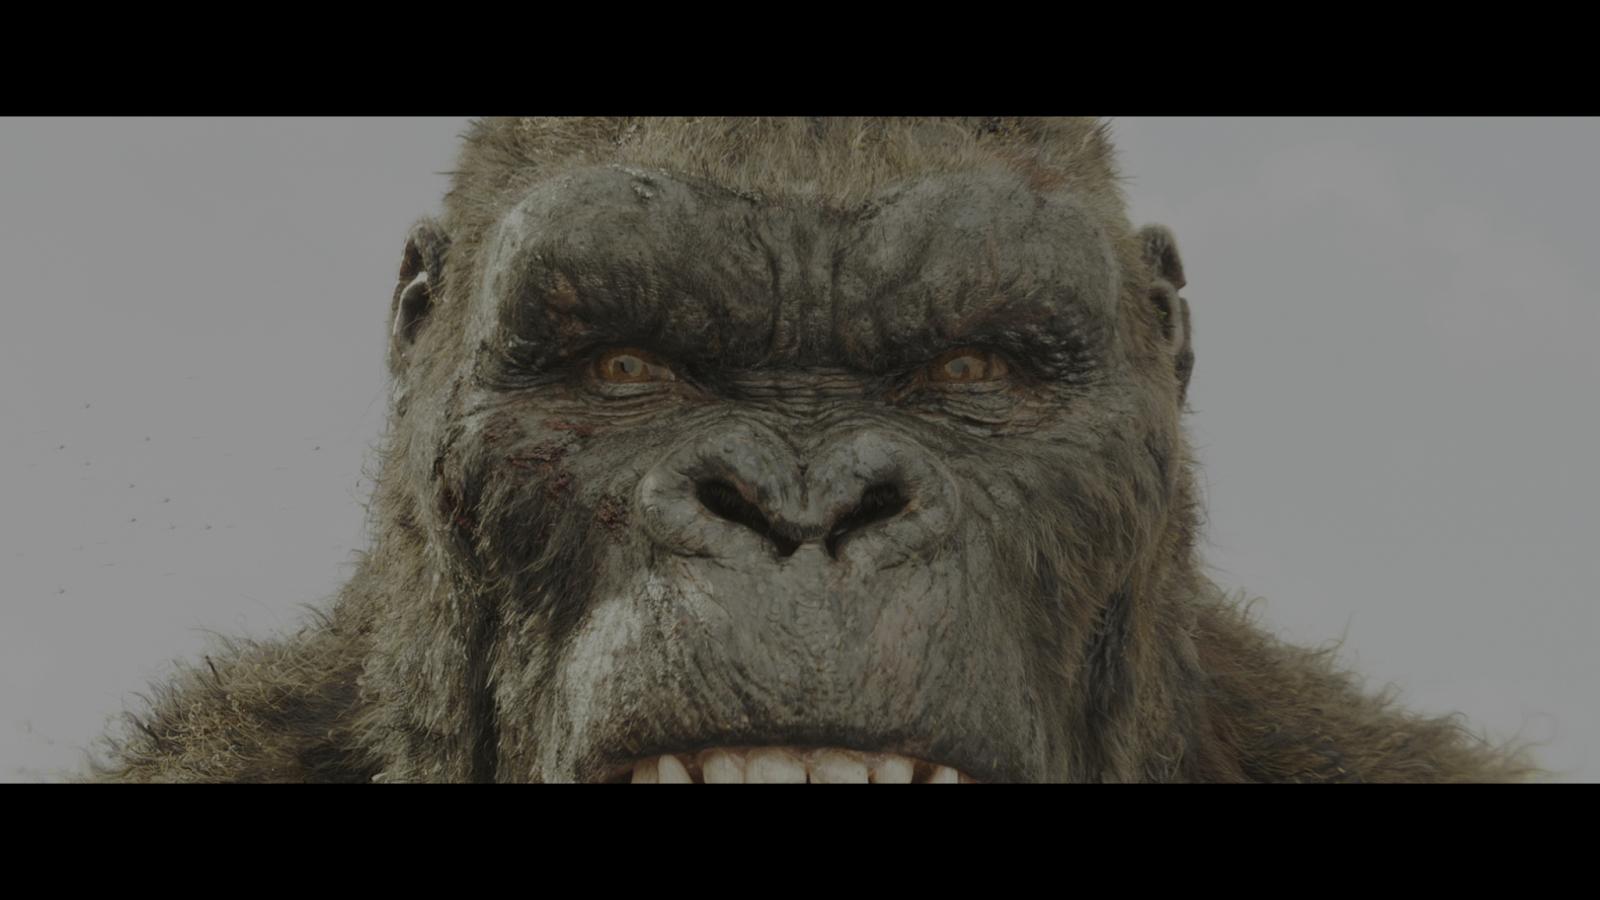 Kong: La isla Calavera (2017) 4K UHD Blu-Ray Completo captura 4